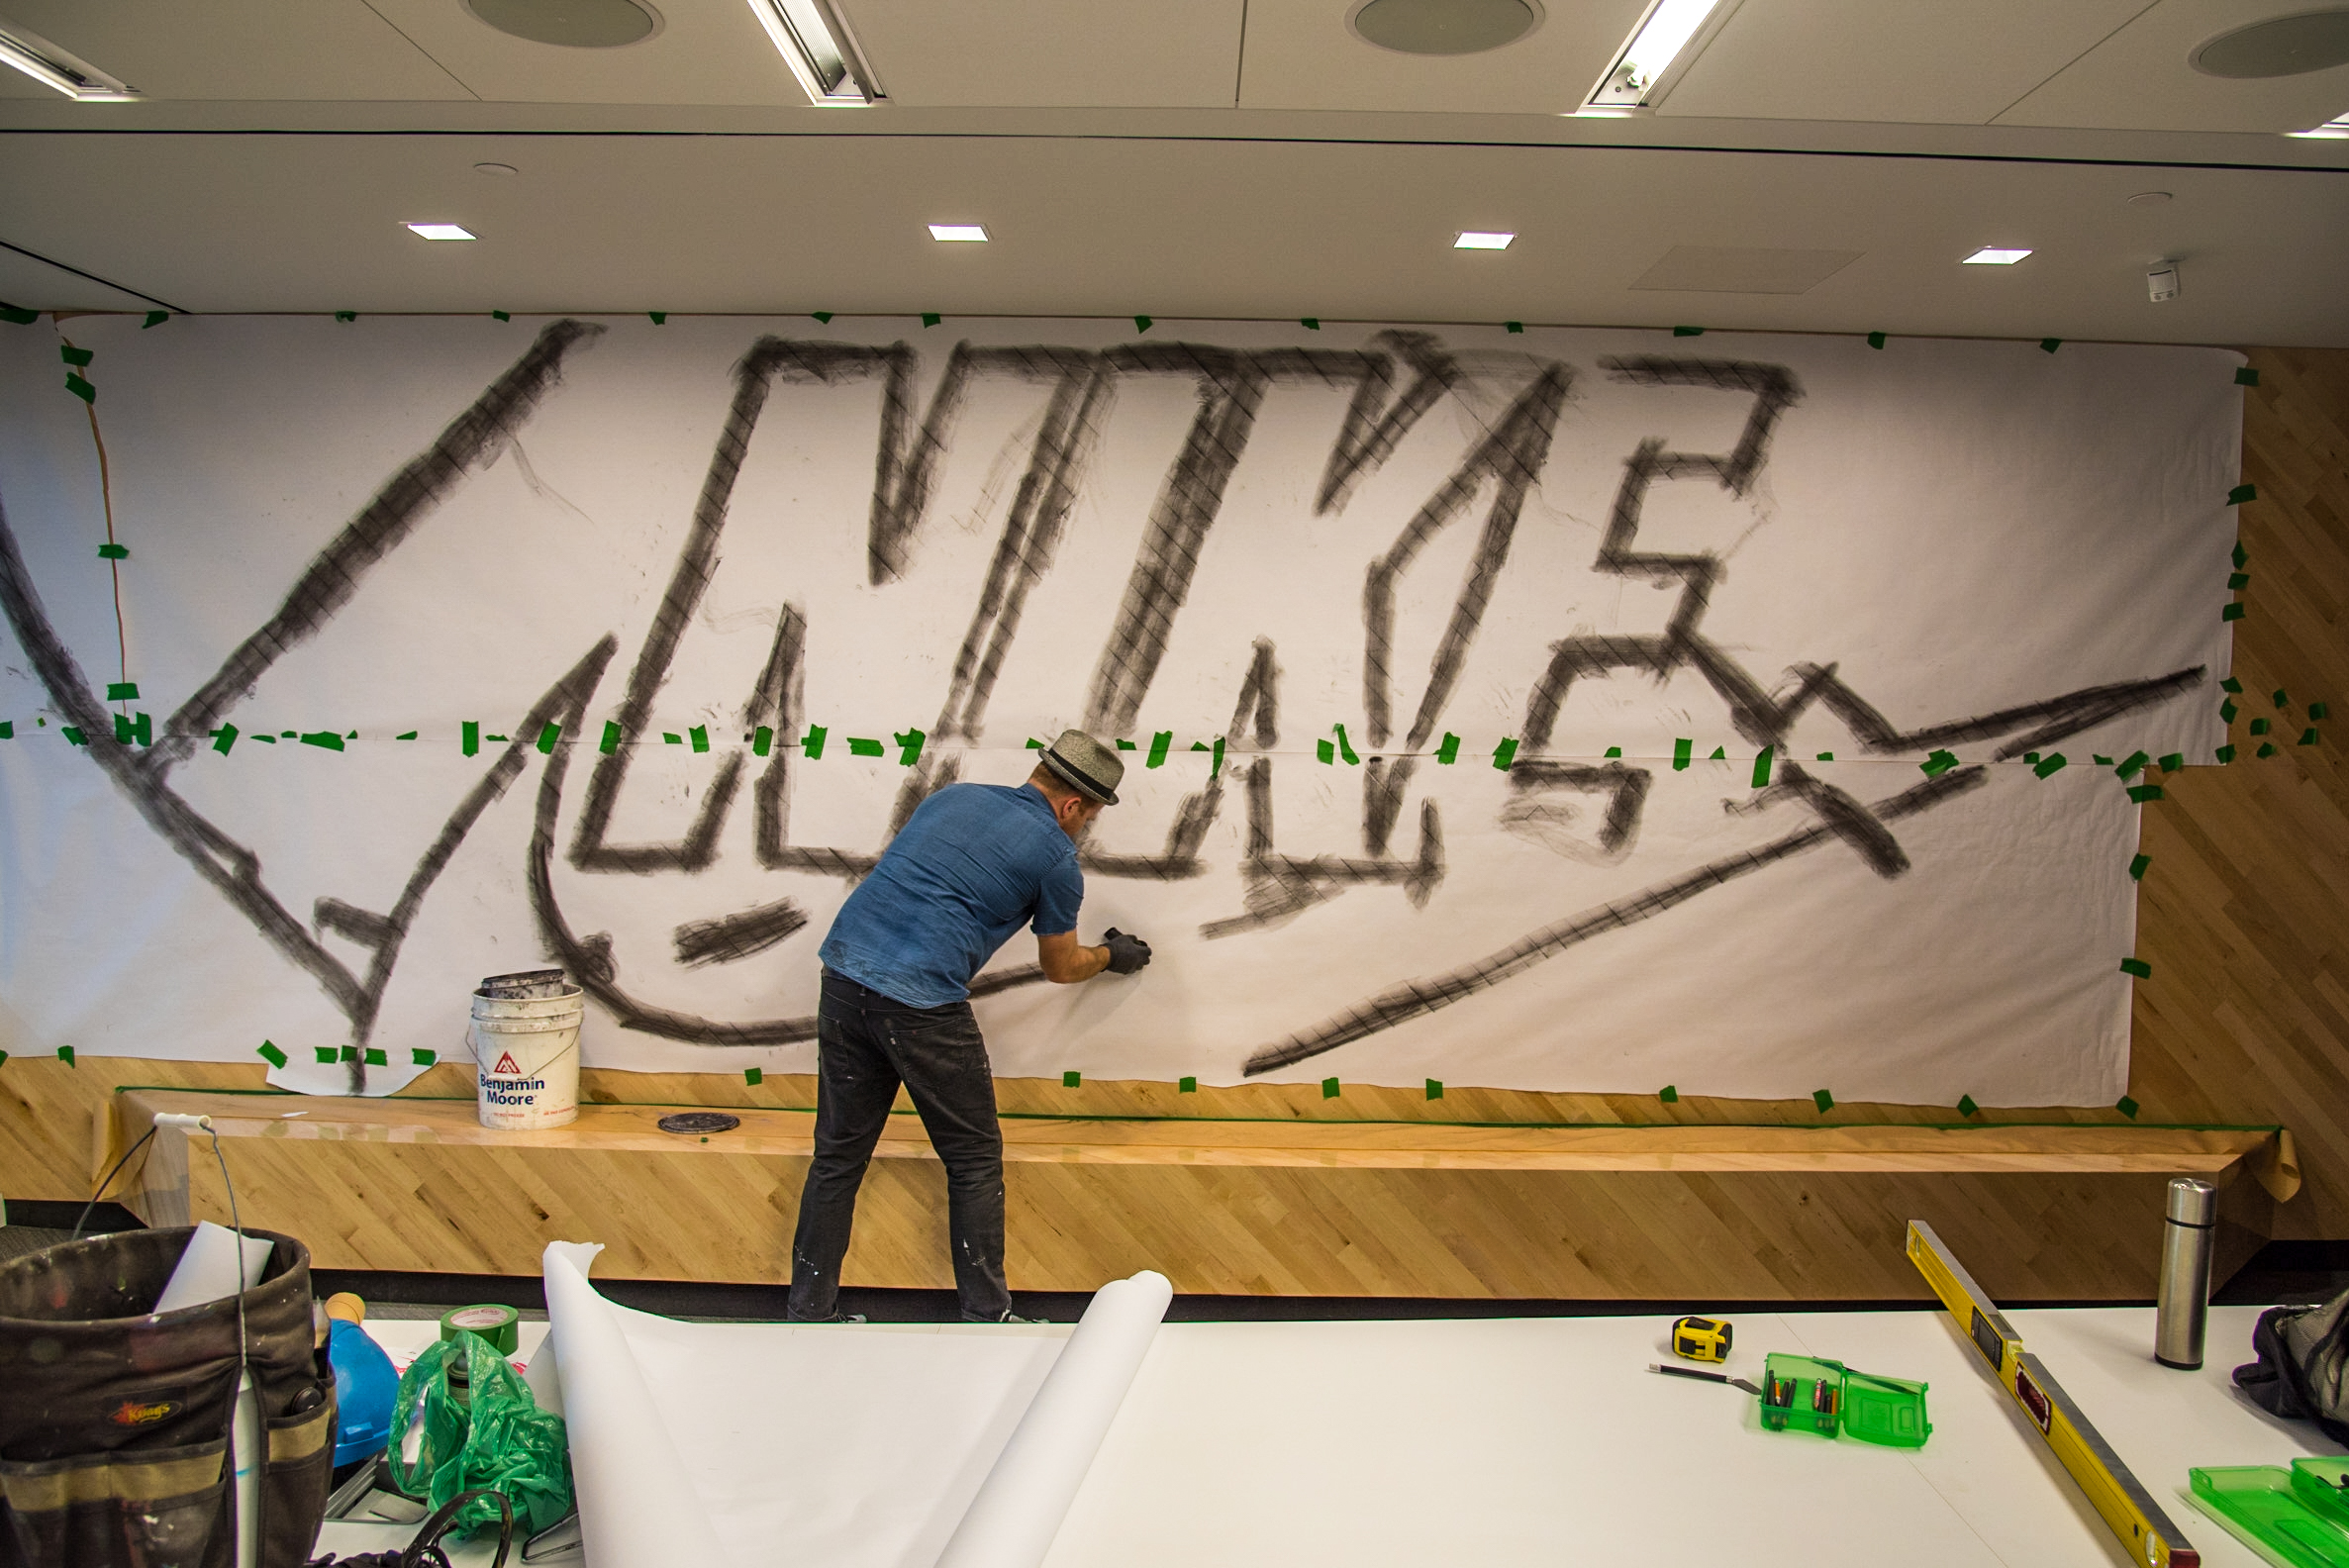 Nike boardroom